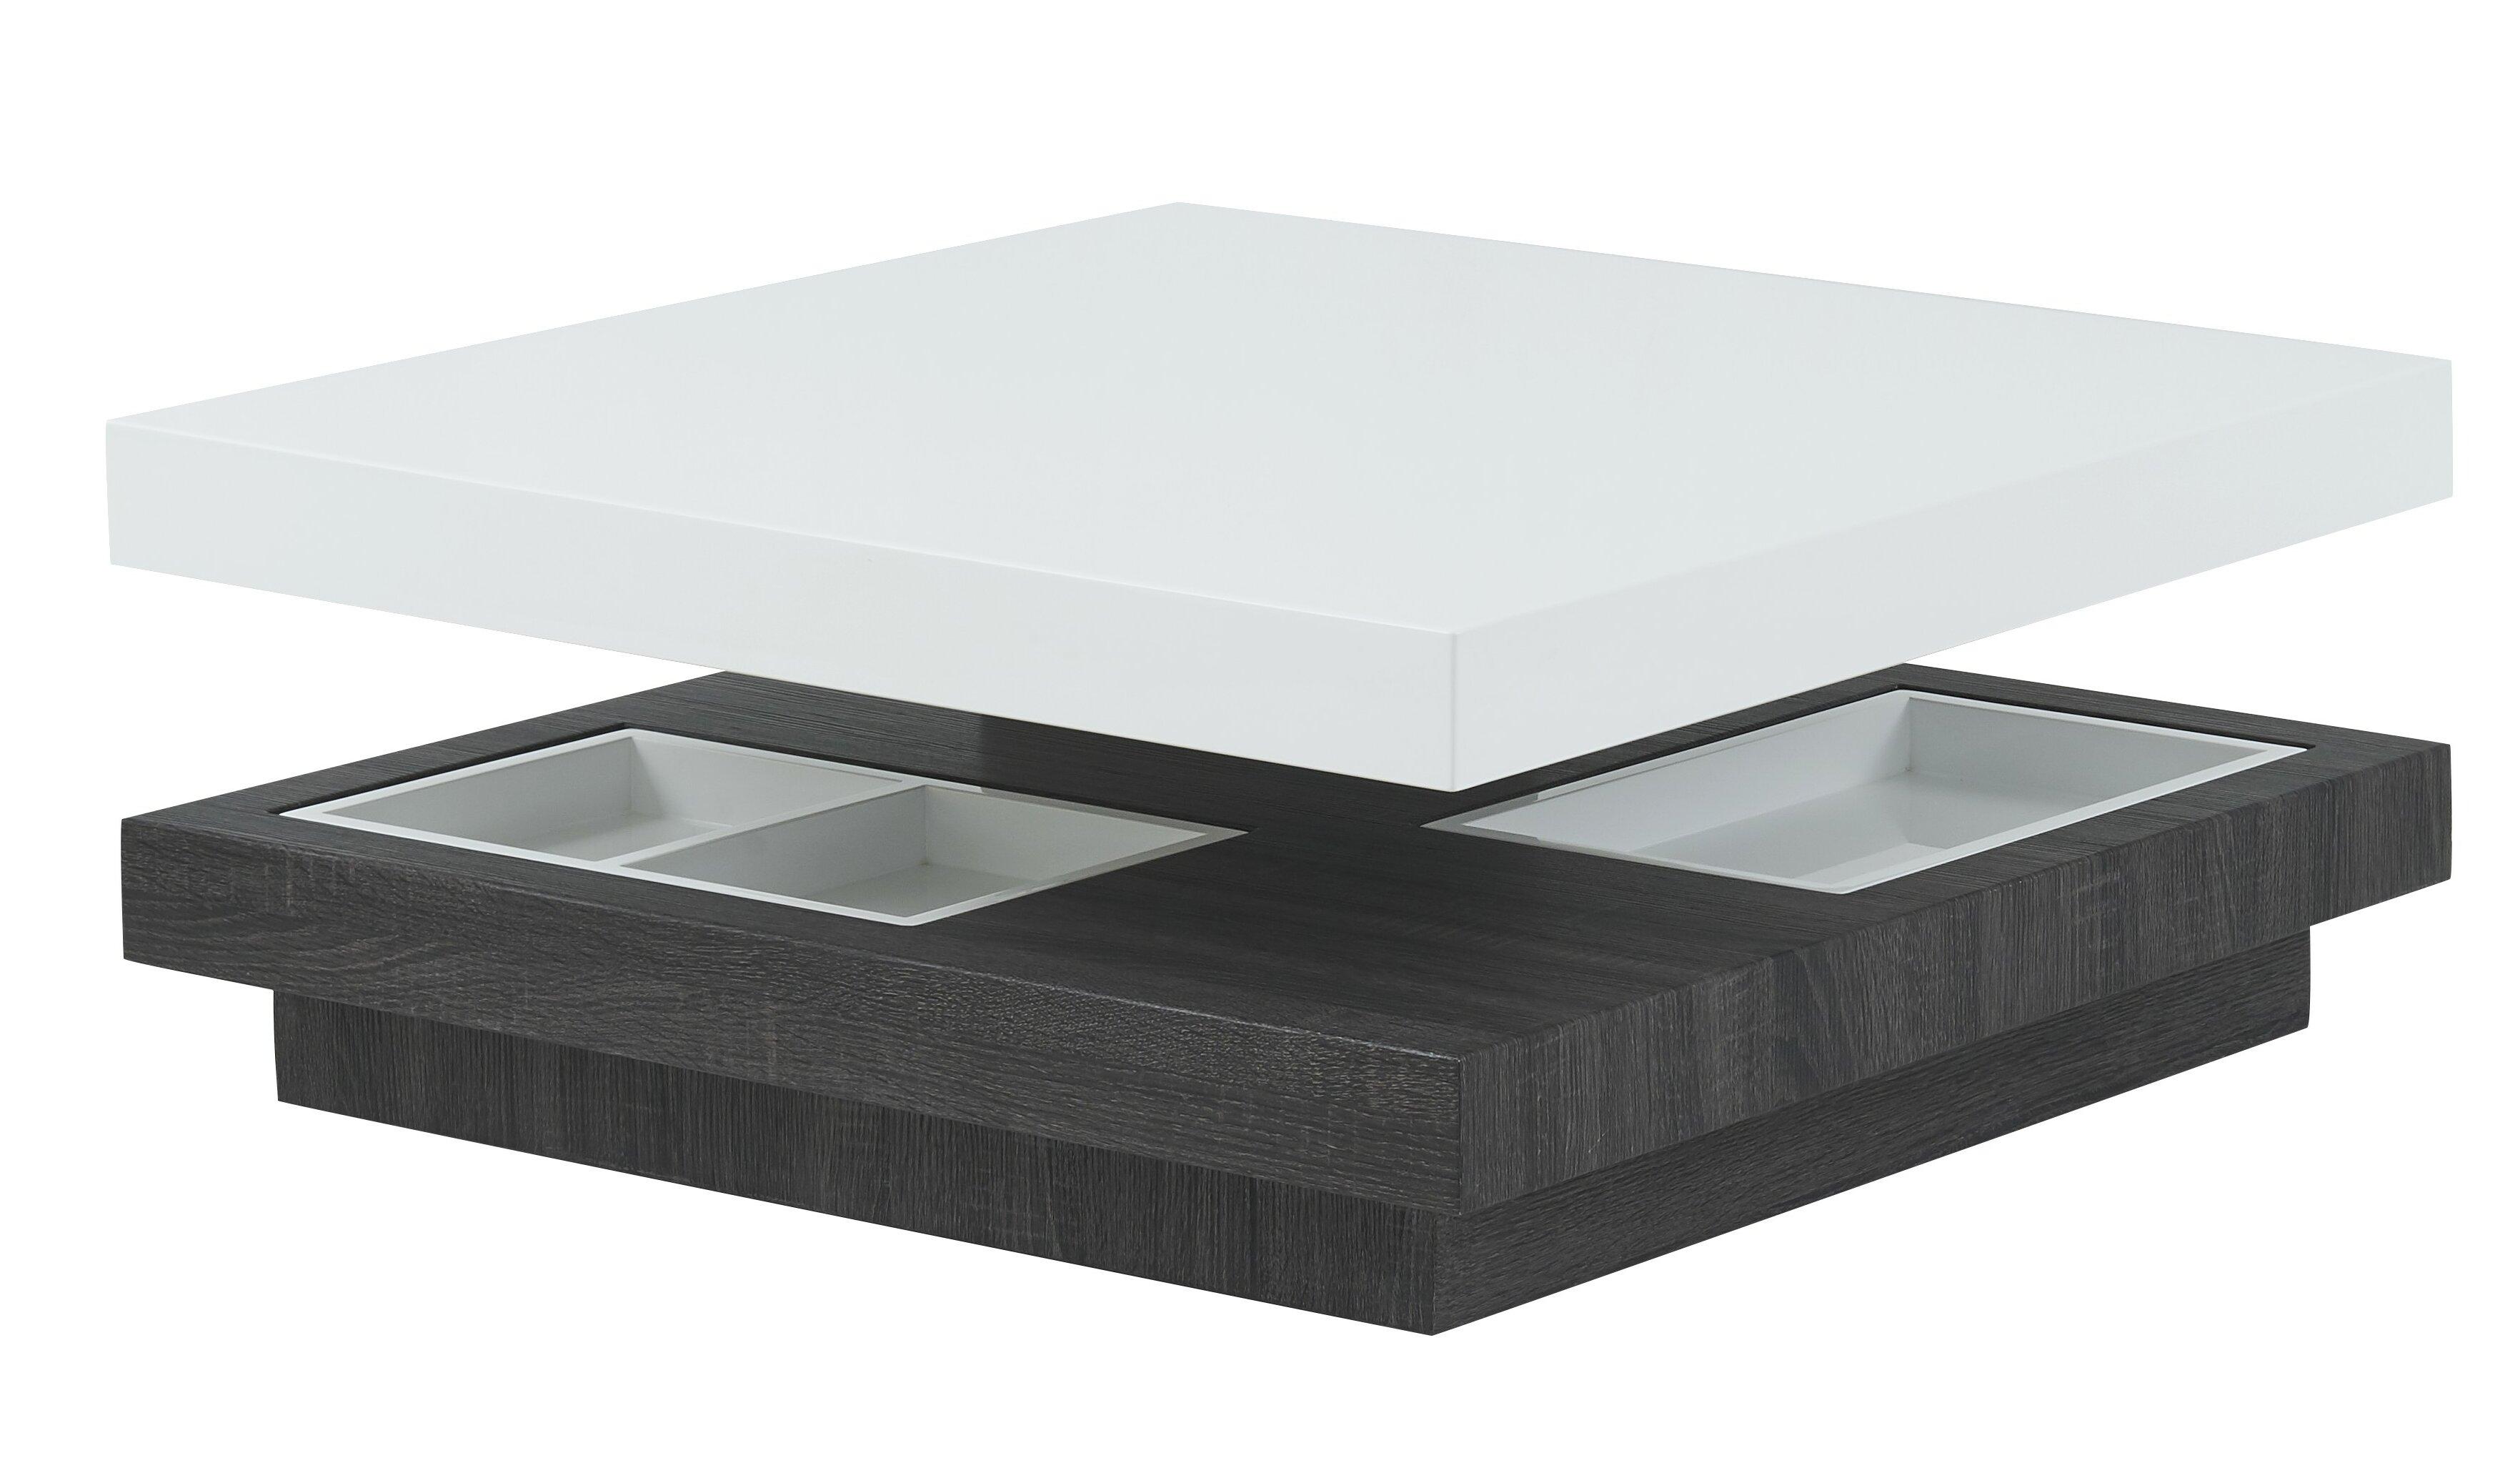 kunigunde coffee table with storage